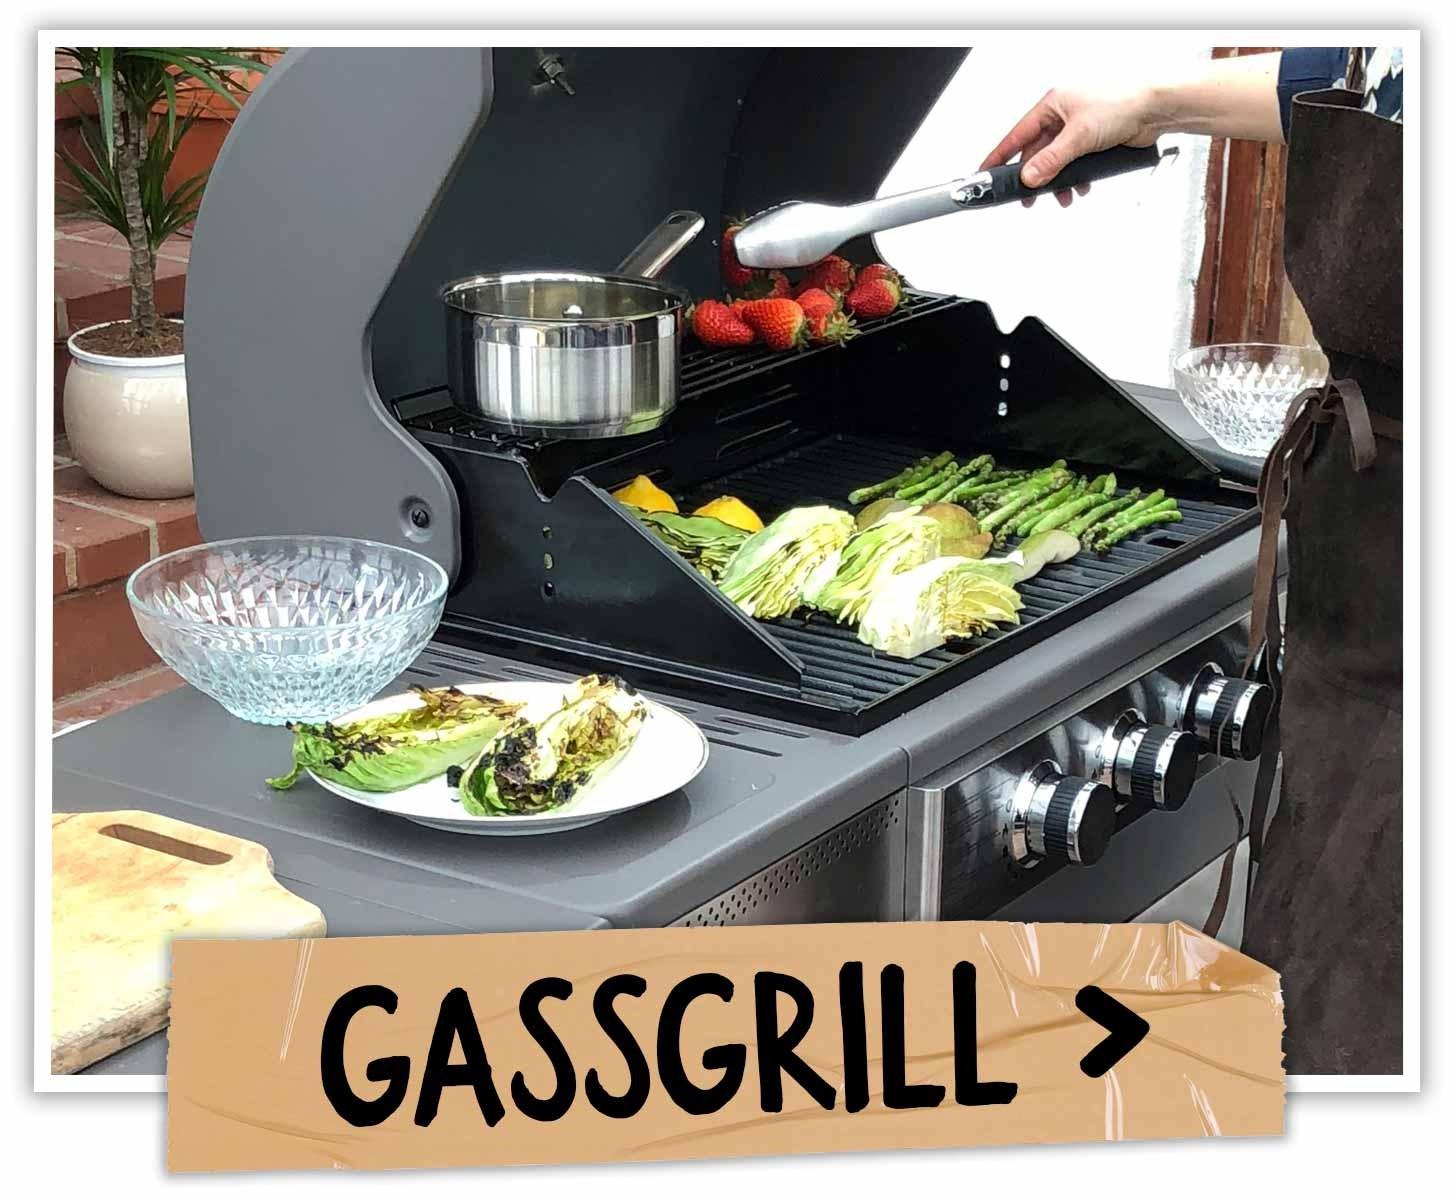 Grillskole - Gassgrill